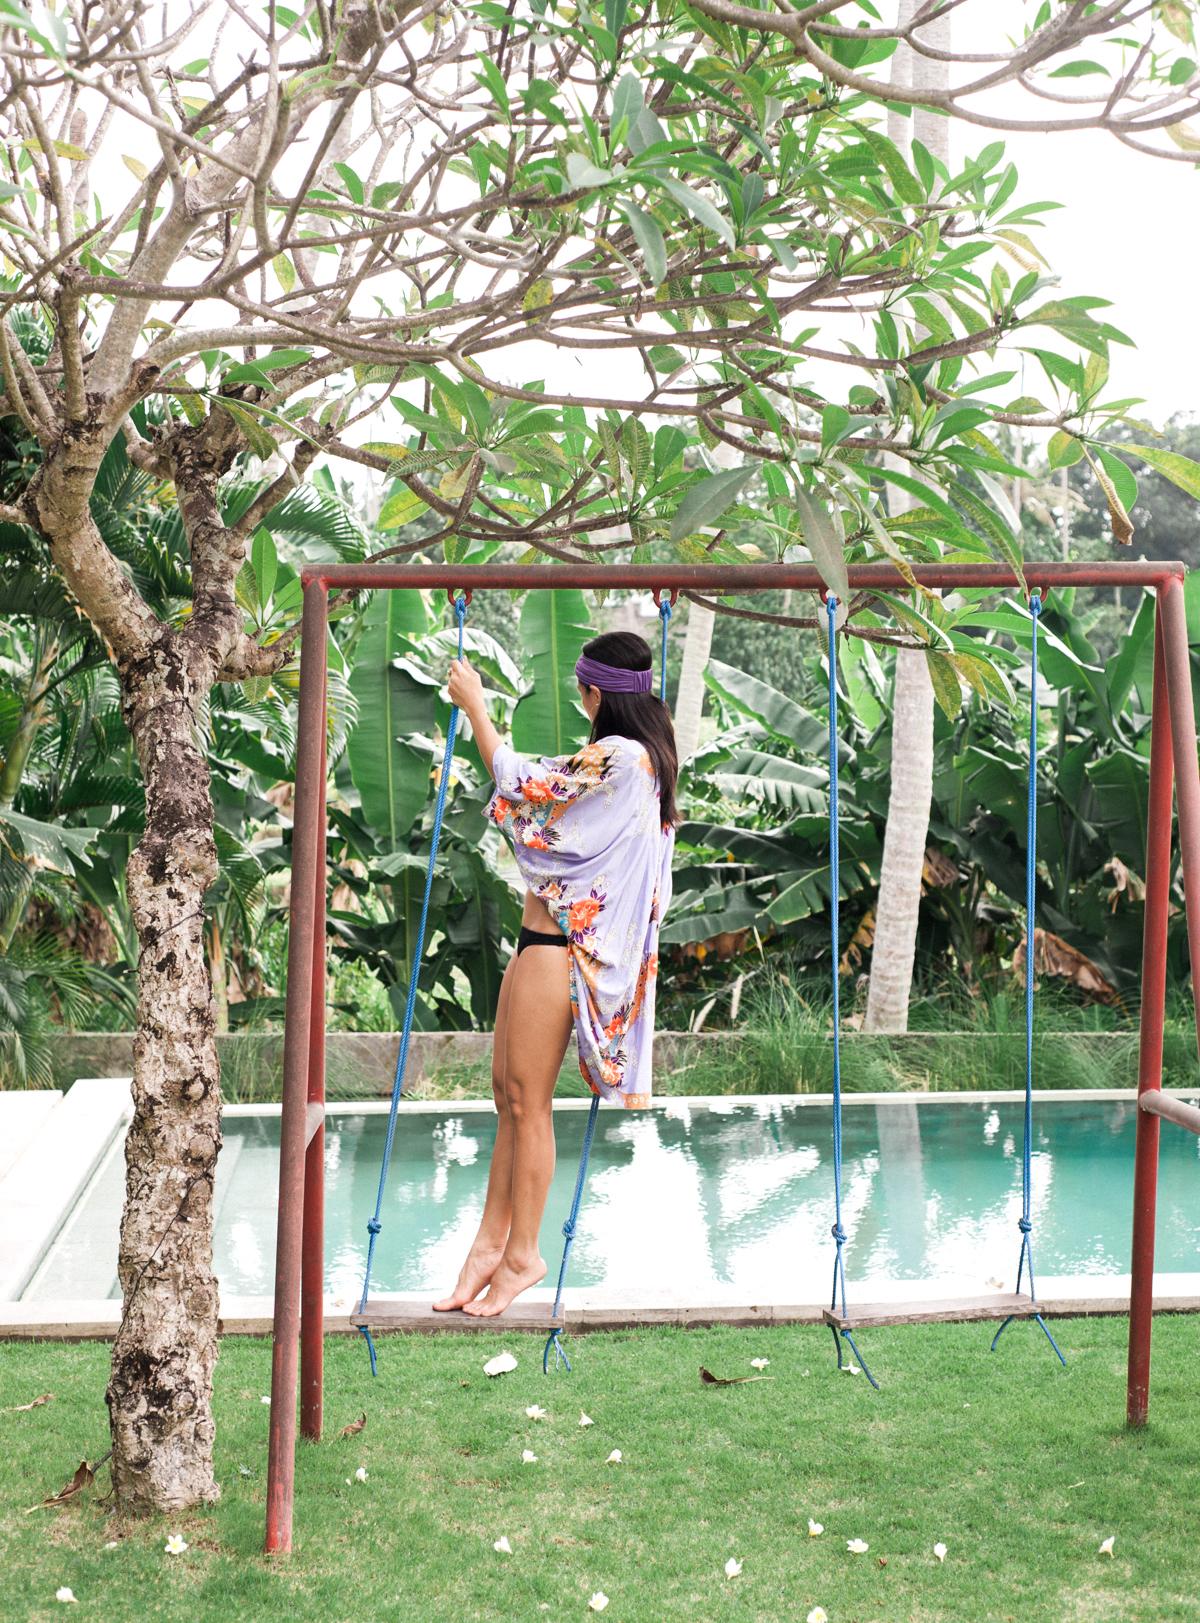 family-photoshoot-Bali-Celine-Chhuon-Photography74.jpg